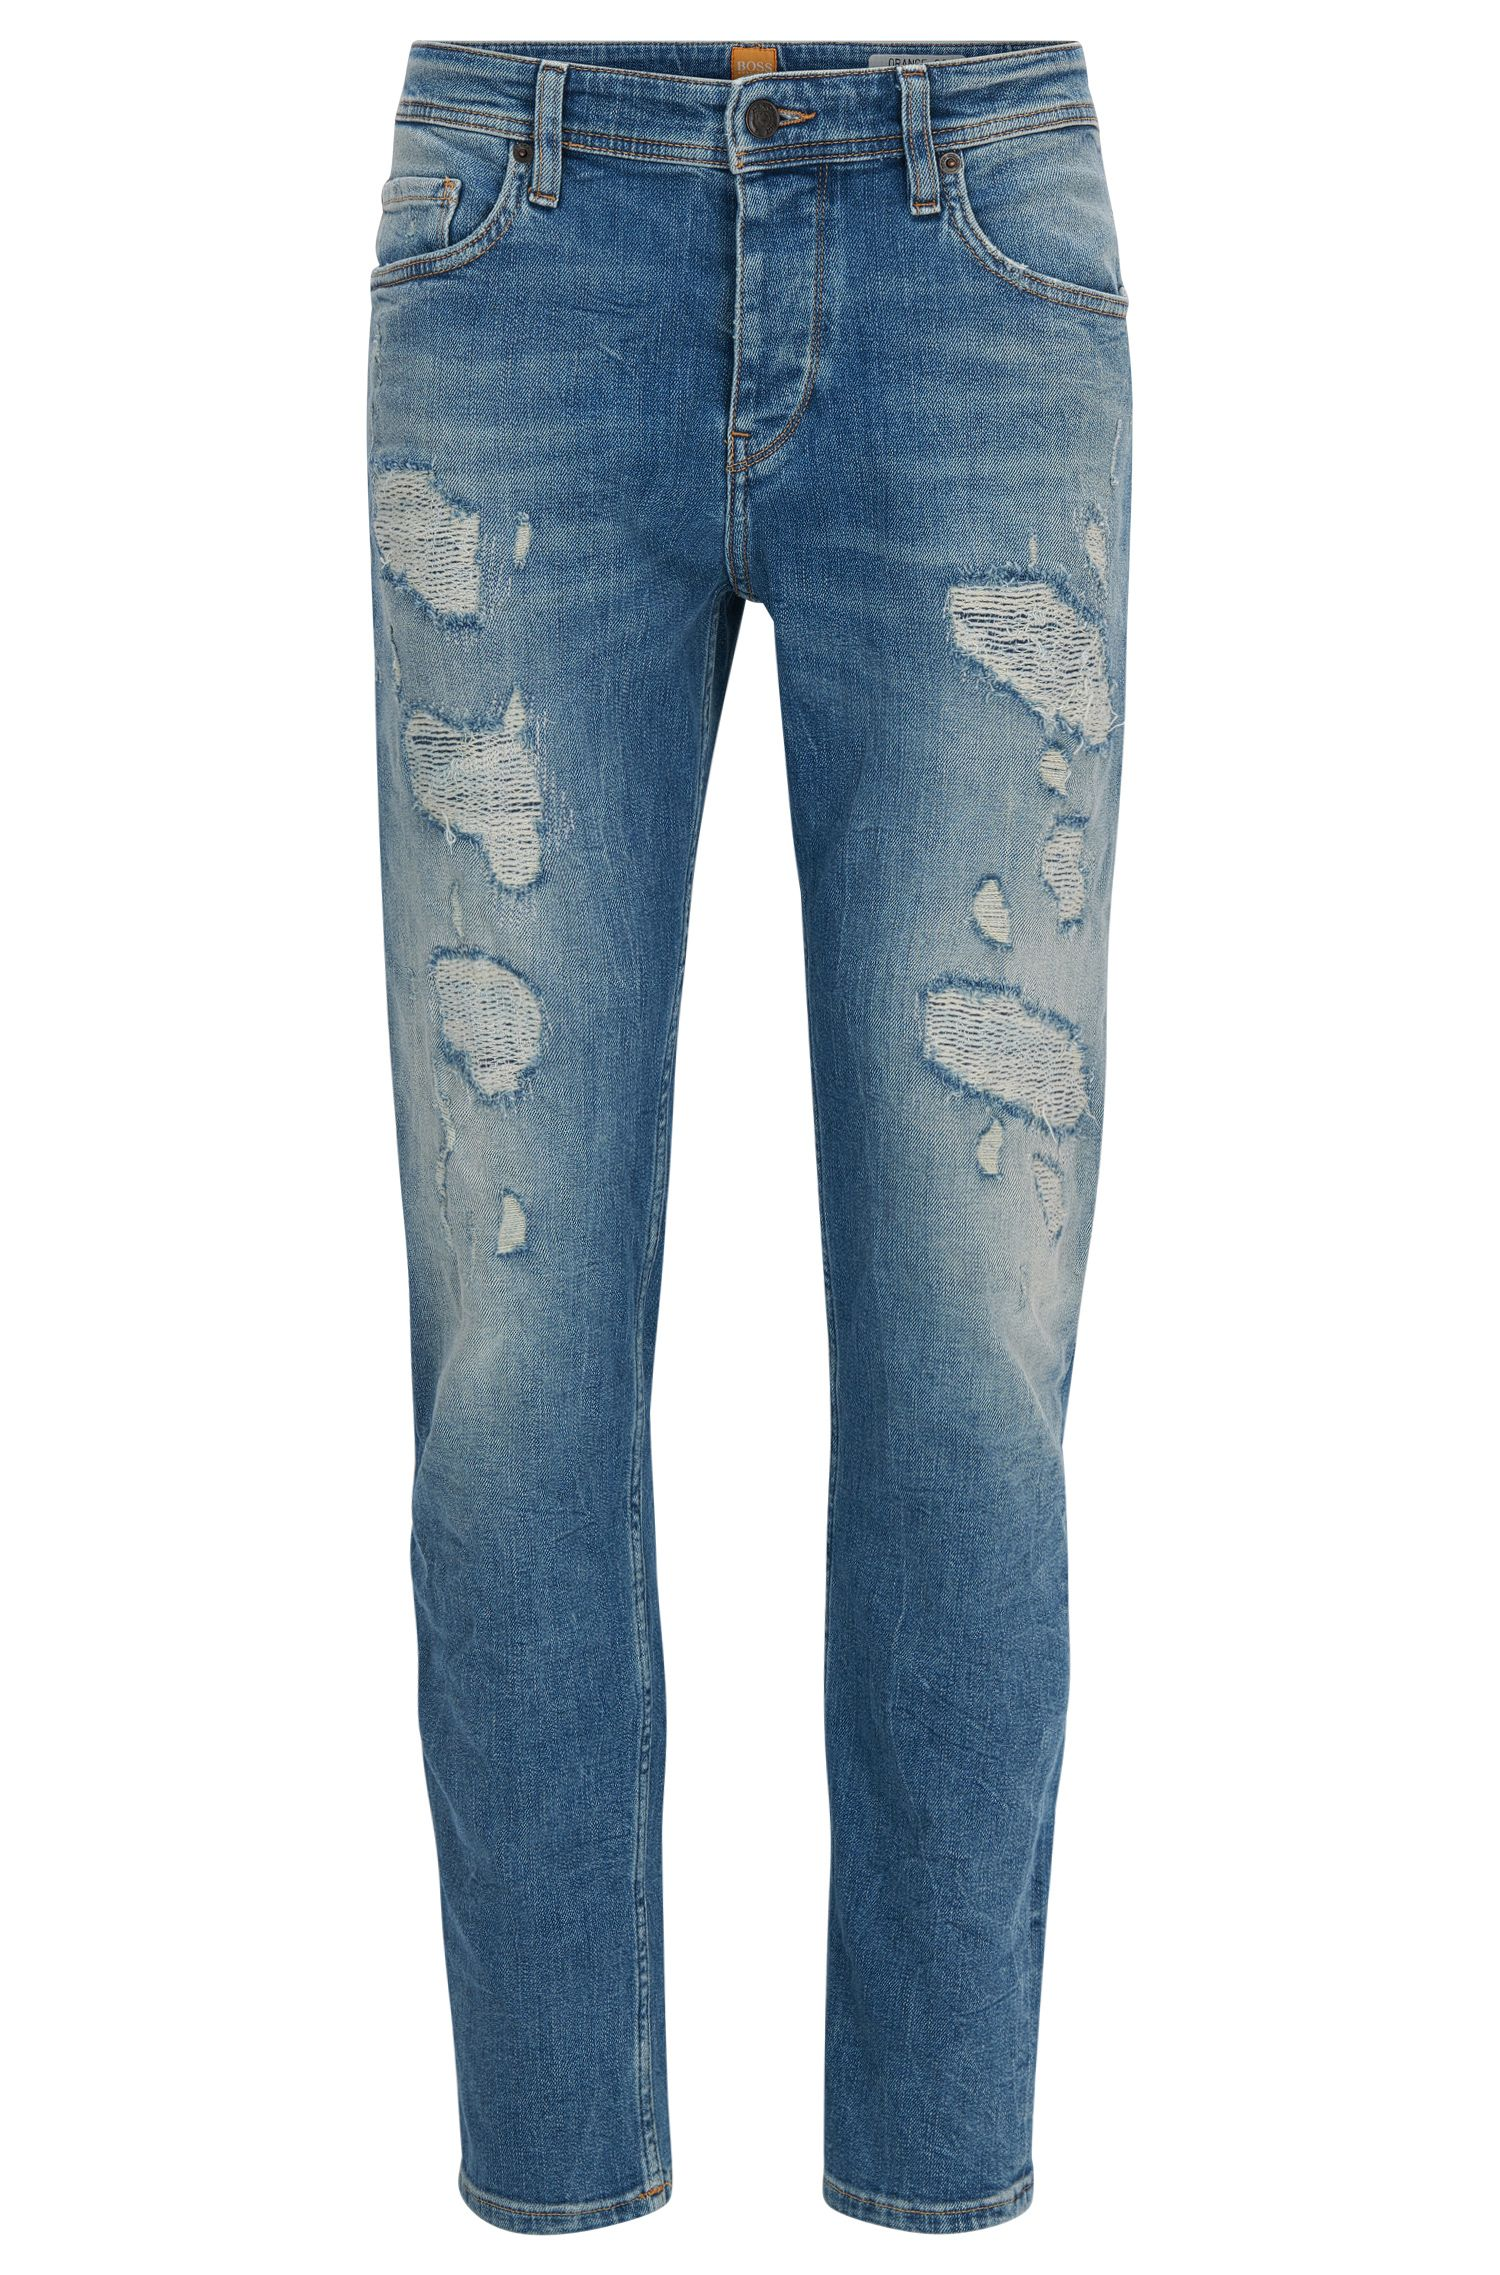 Jeans Tapered Fit en denim stretch confortable